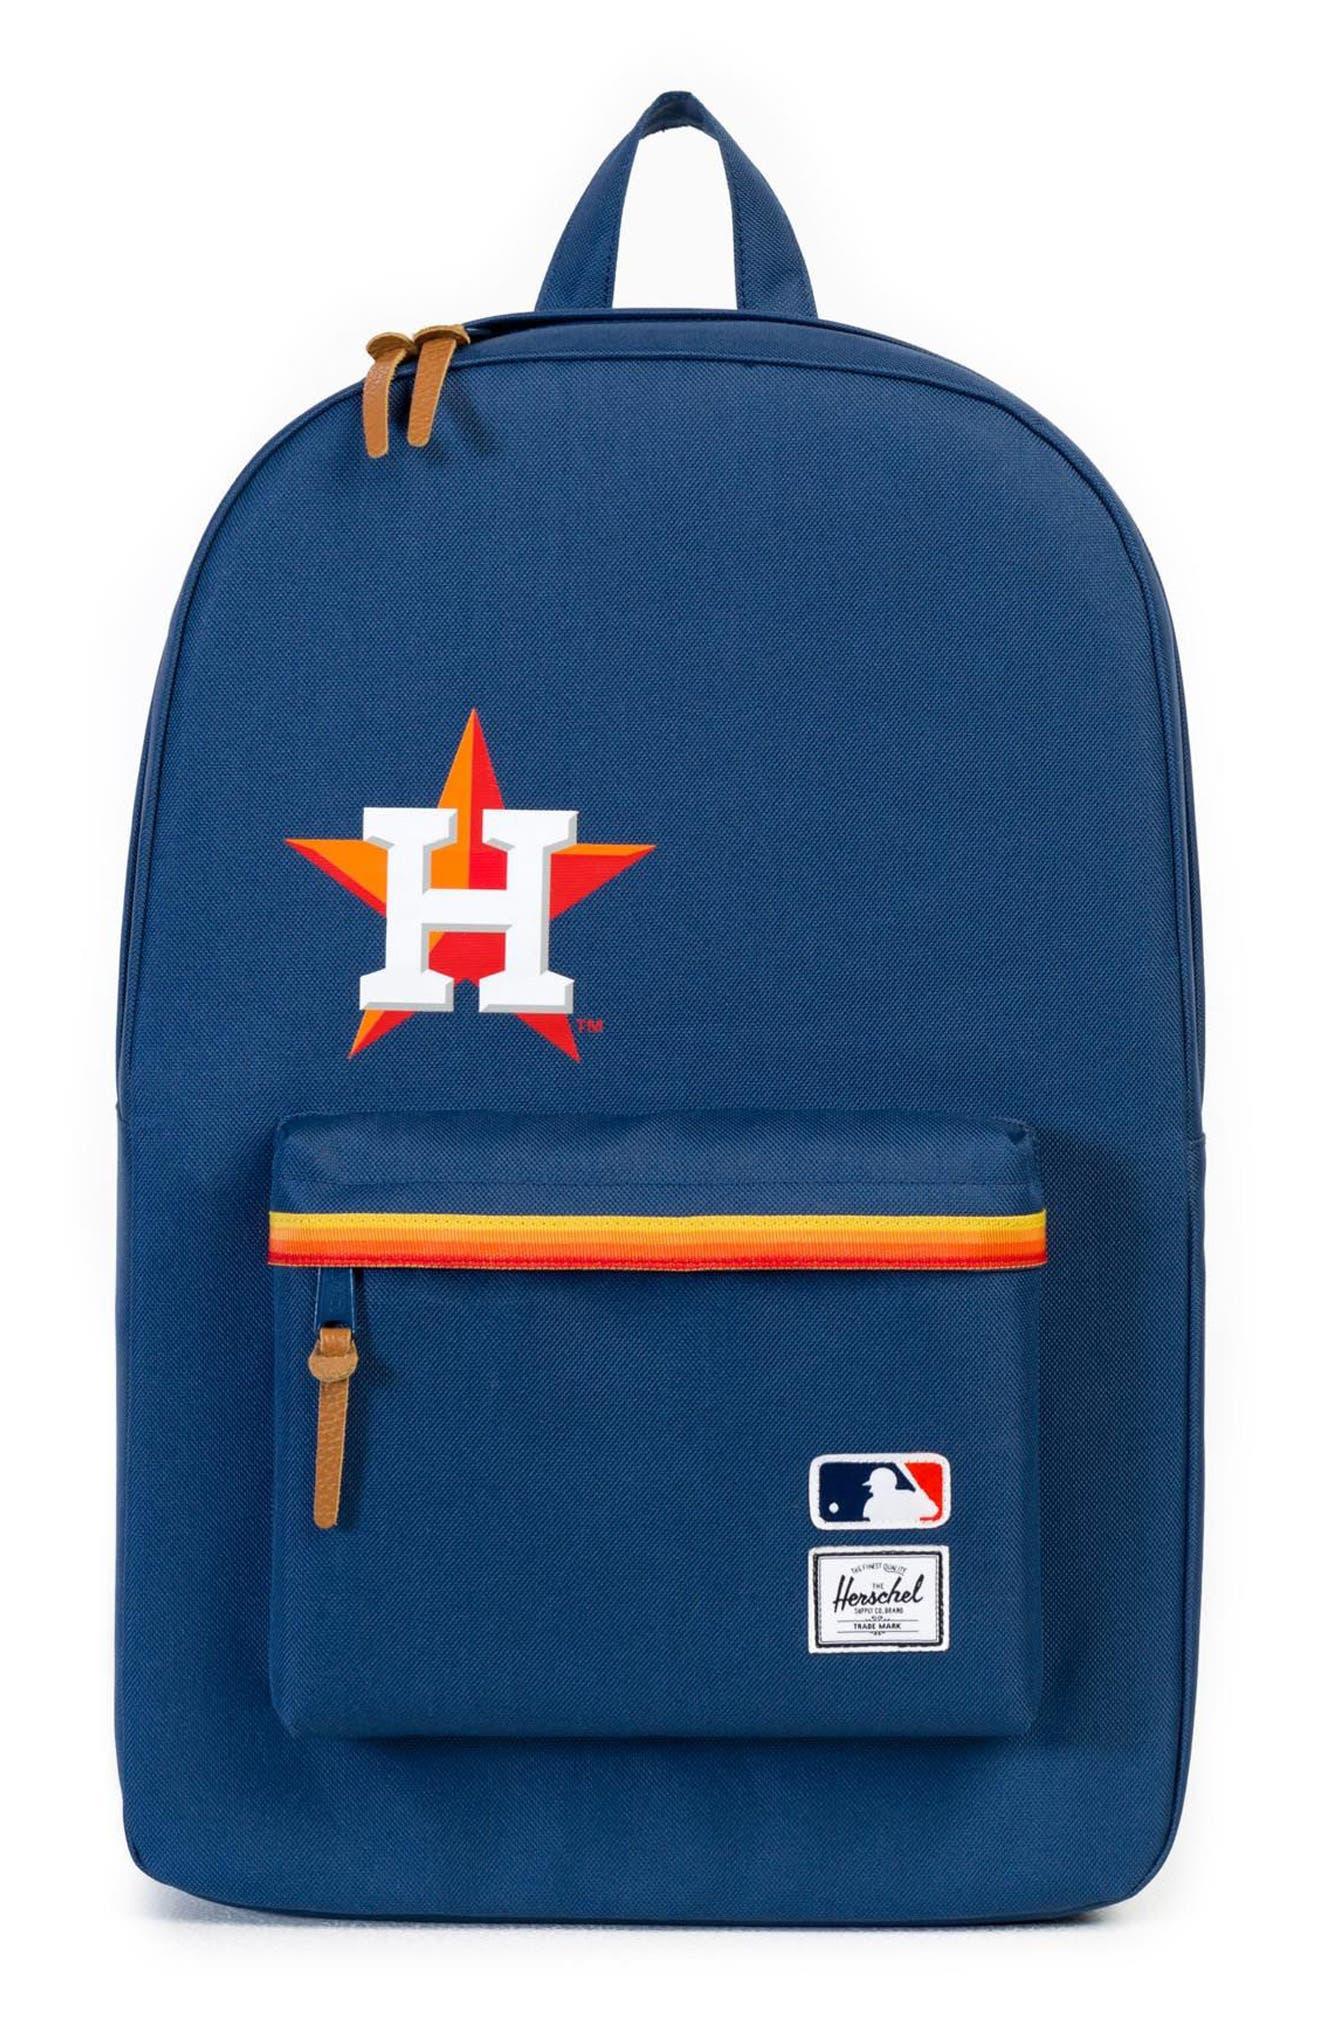 Heritage - MLB American League Backpack,                             Main thumbnail 3, color,